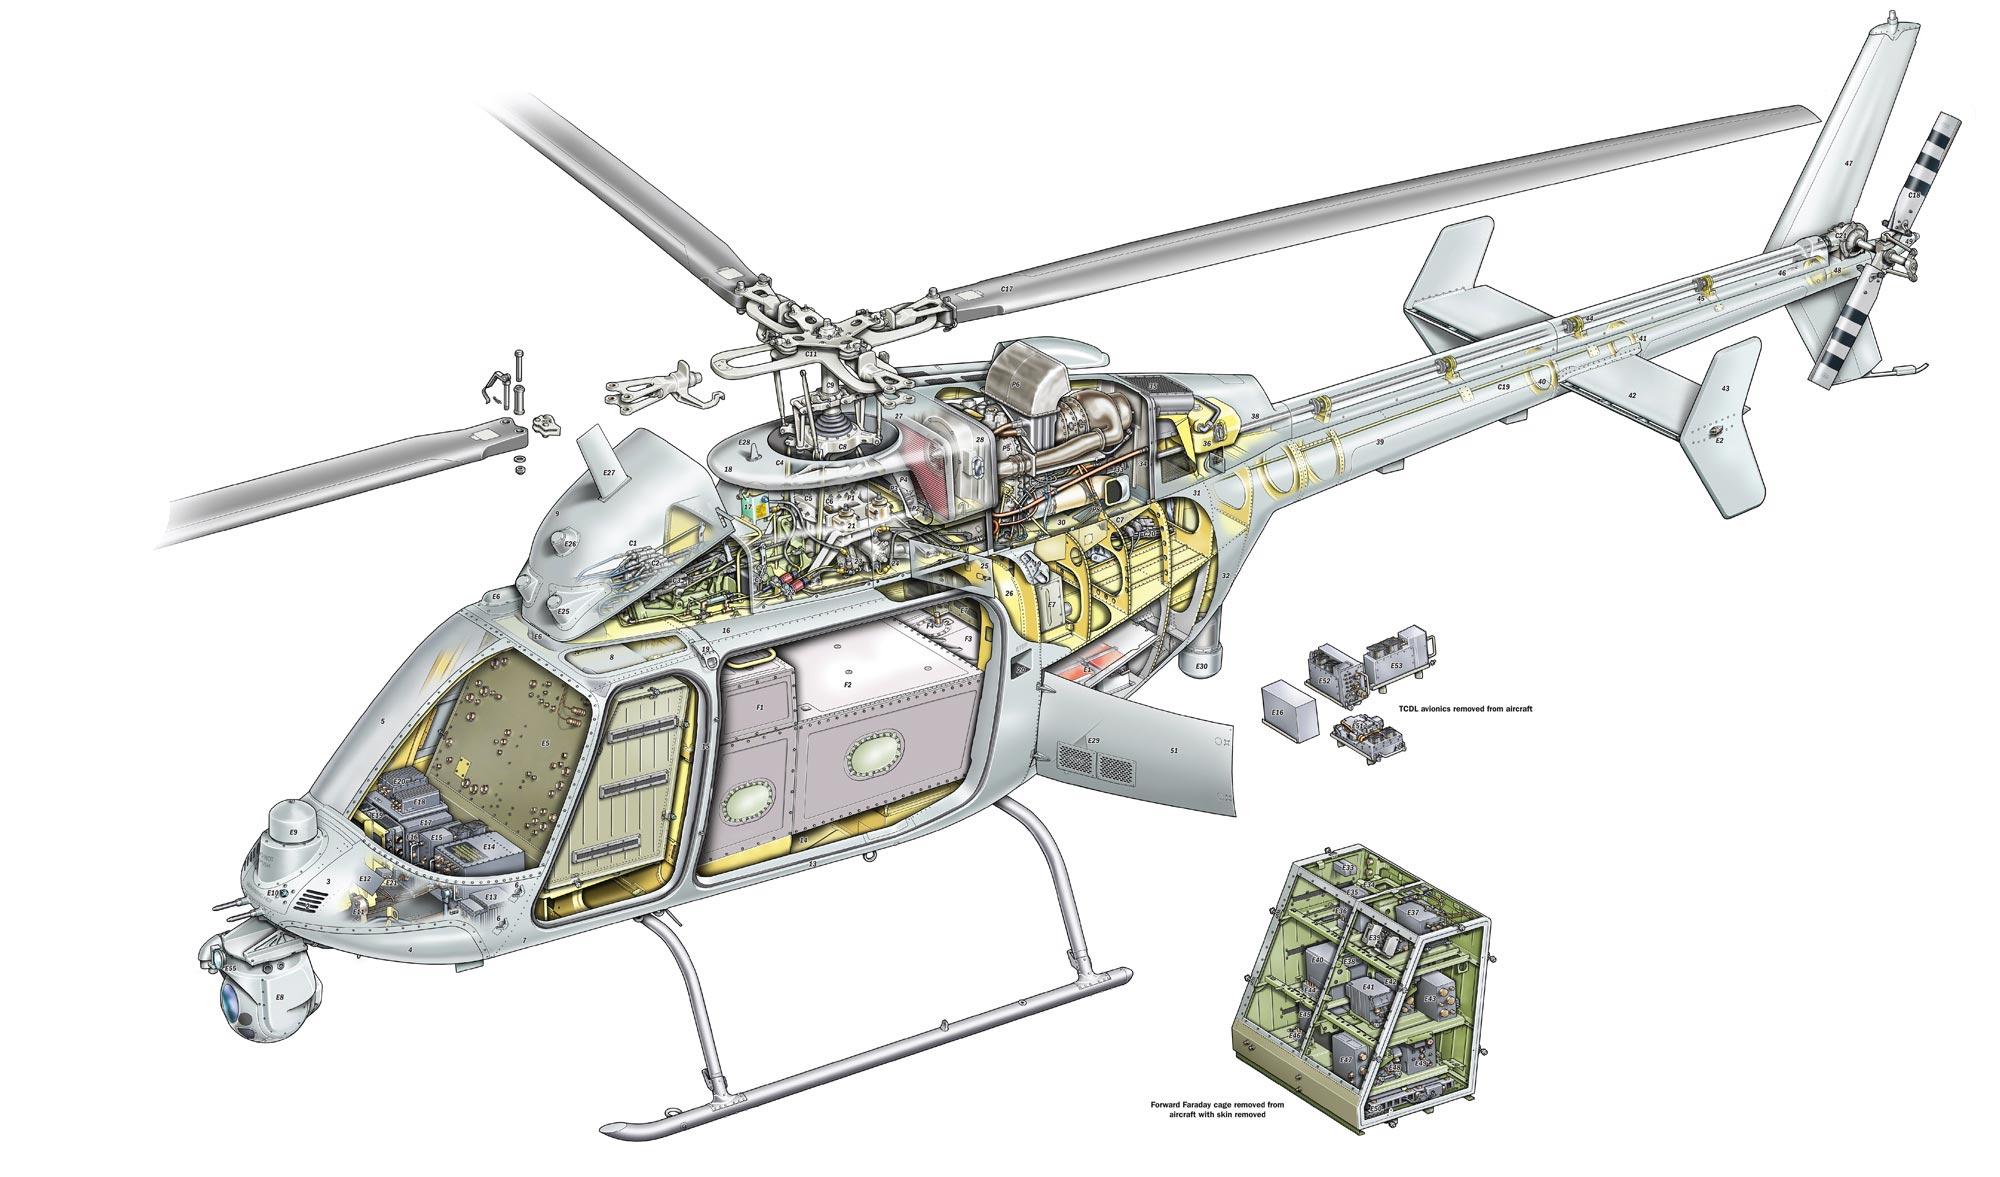 Northrop Grumman MQ-8C Fire Scout cutaway